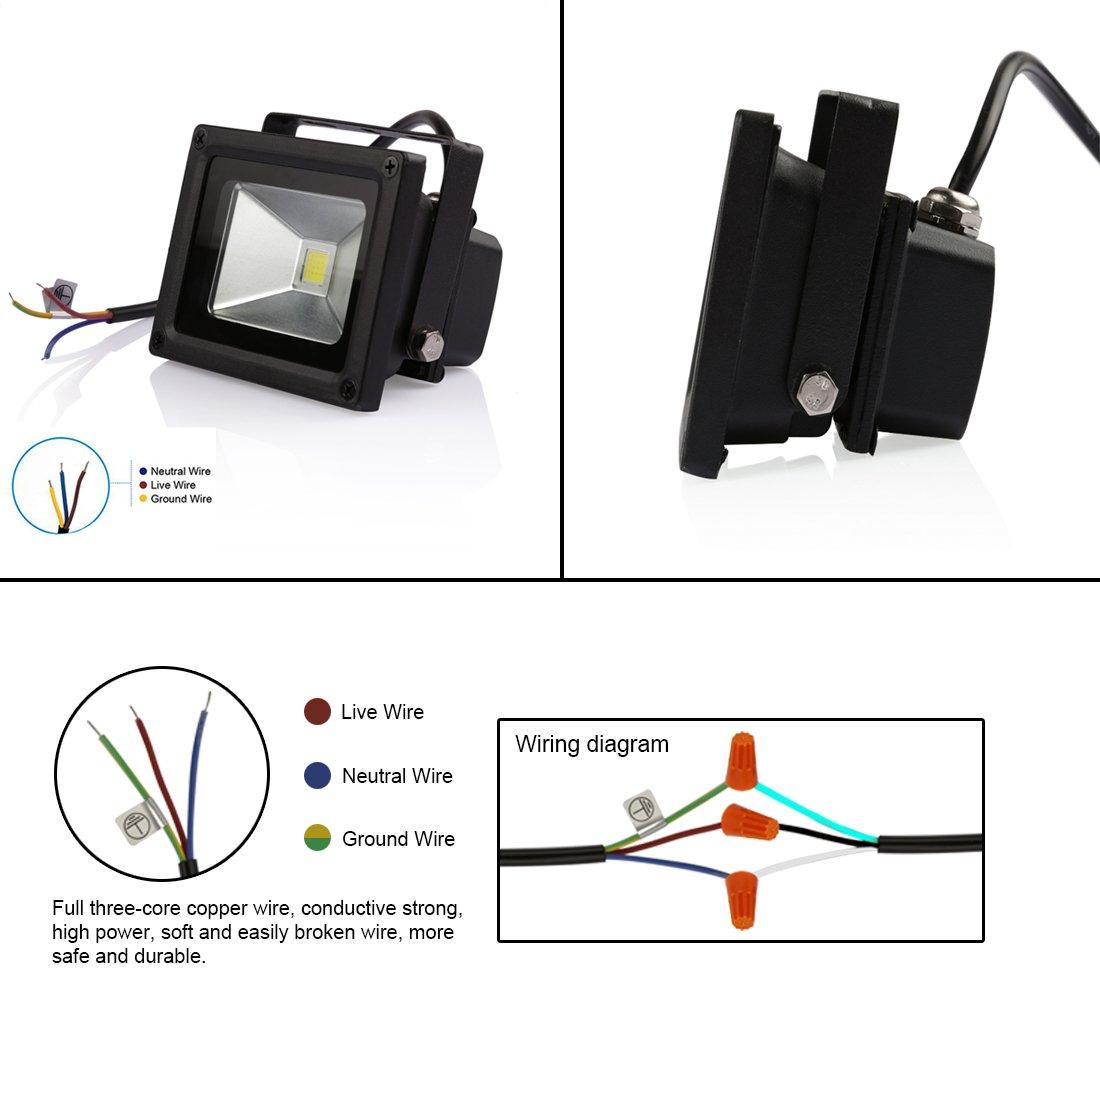 61PtILjslEL._SL1100_ ledmo 10w outdoor led waterproof ip65 800lm 3000k flood lights Basic Electrical Wiring Diagrams at beritabola.co